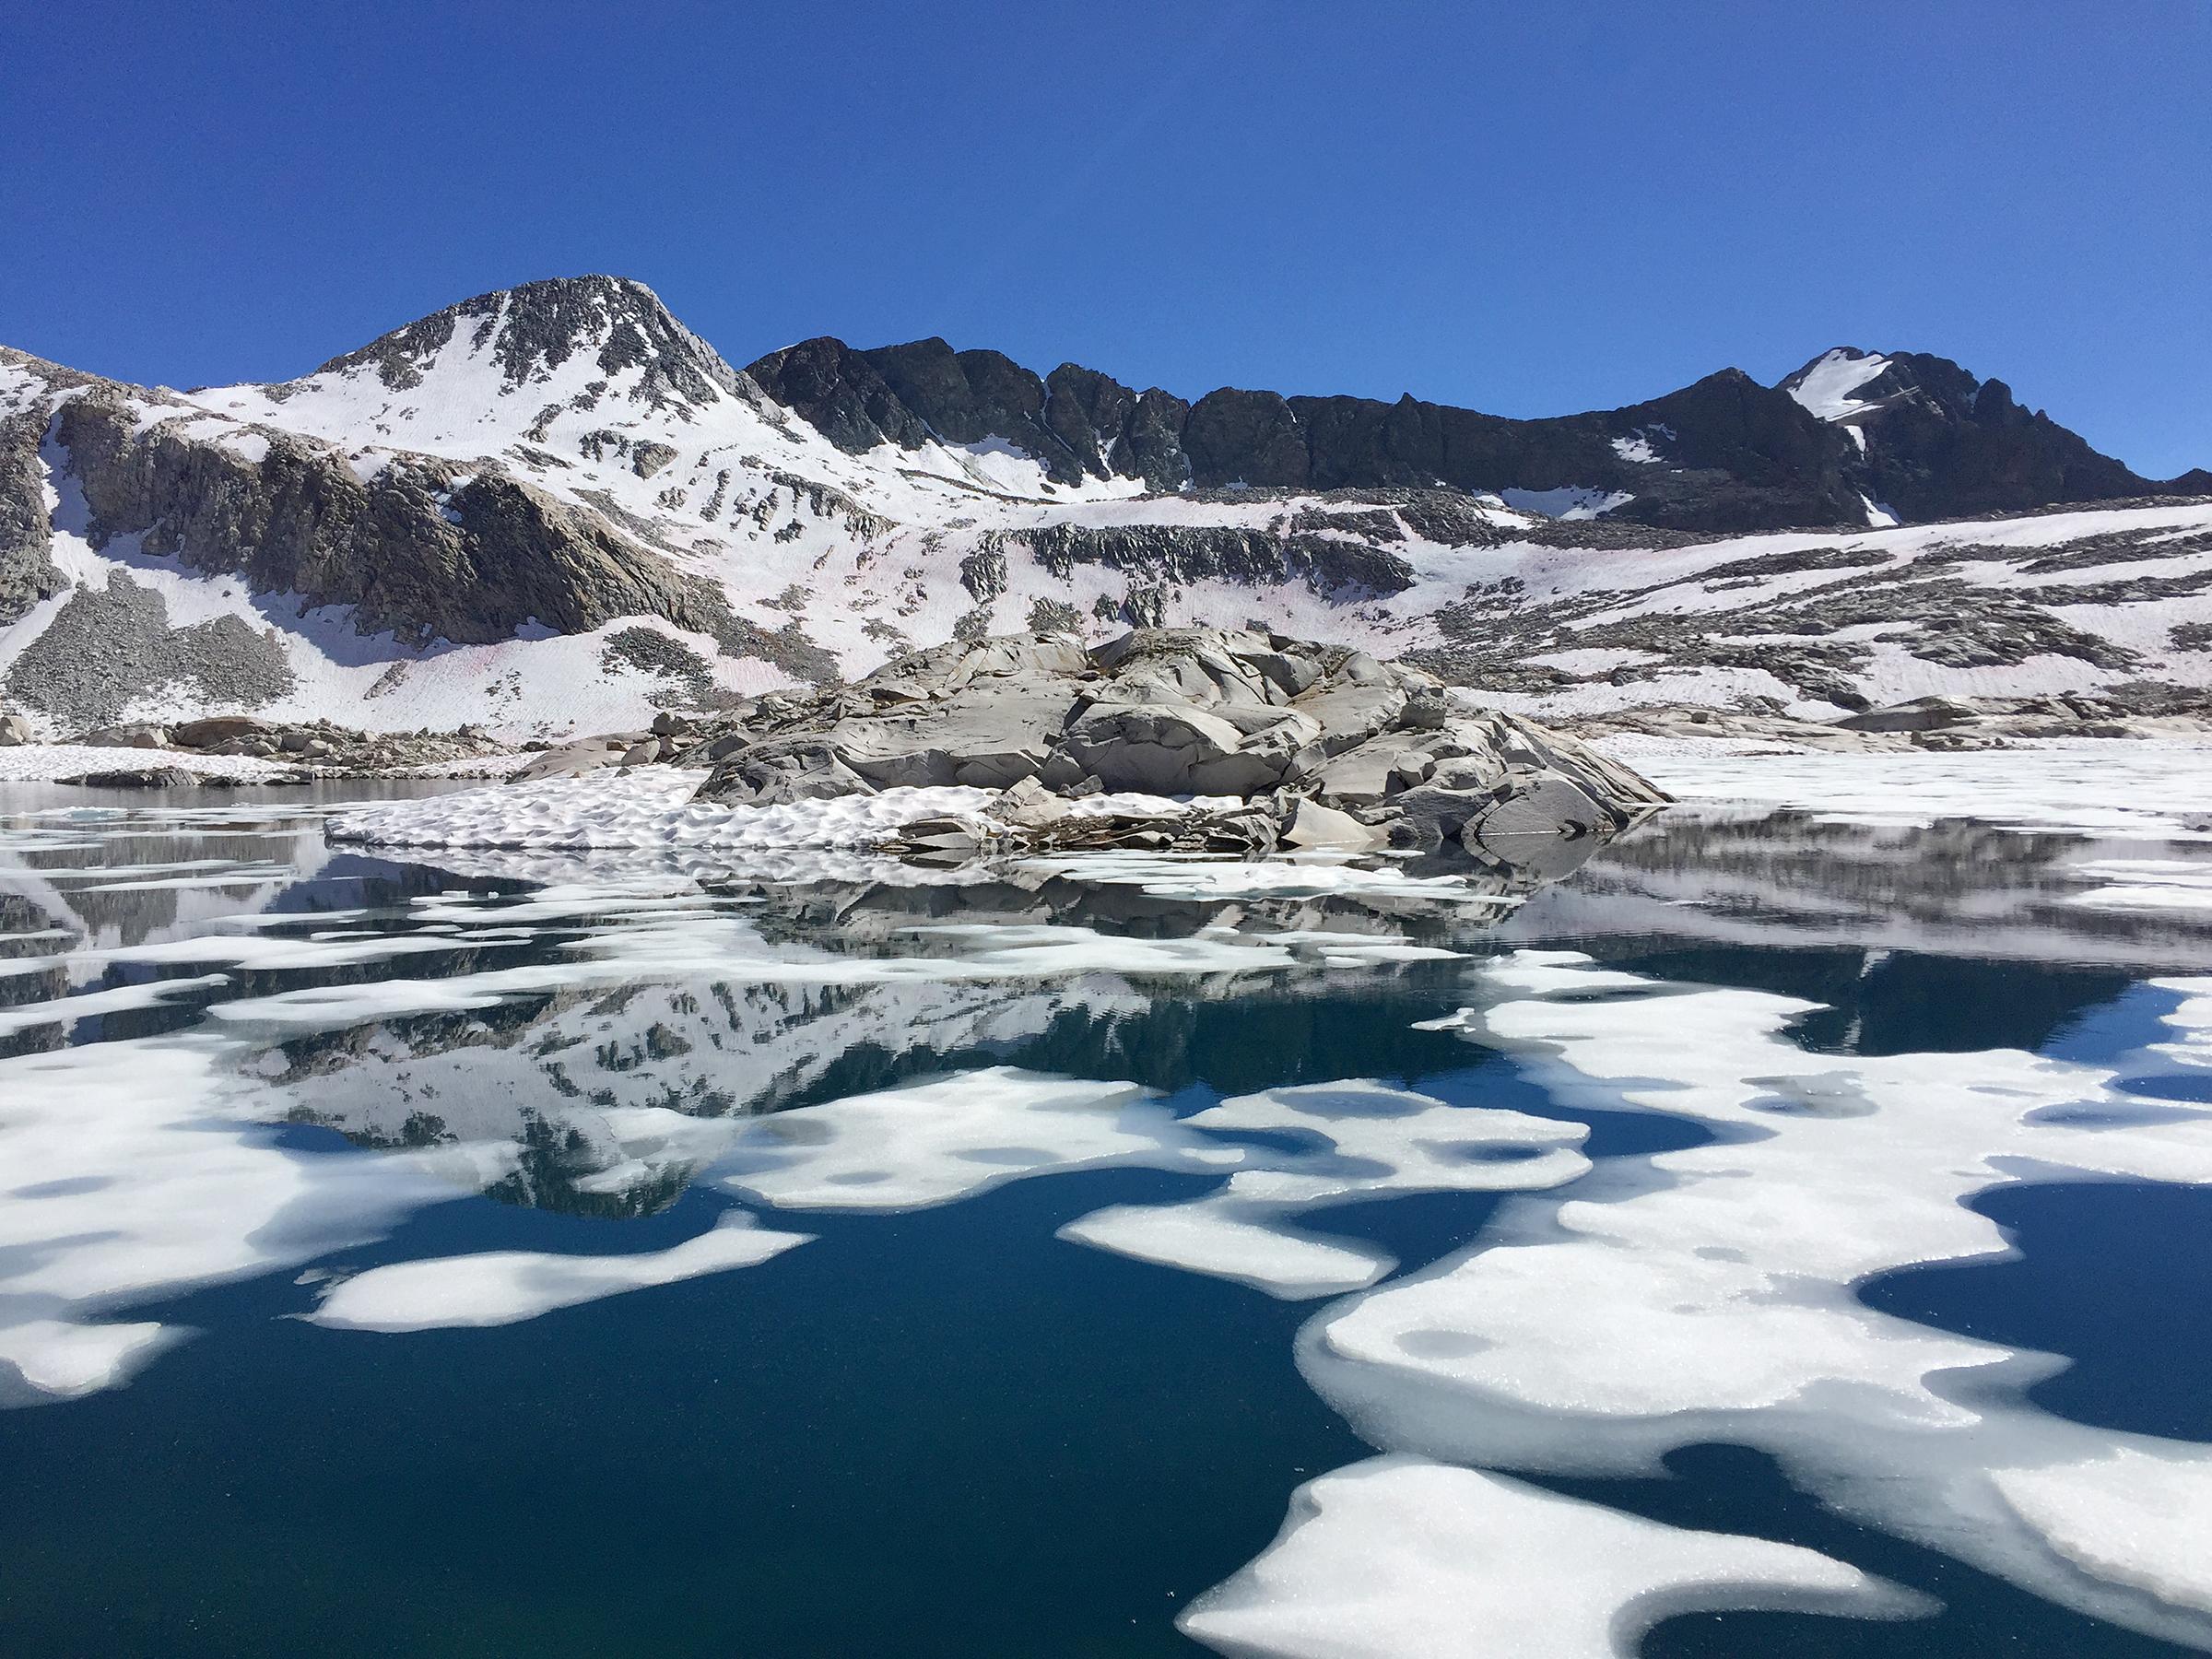 trailname-backstroke-sierra-high-route-2017_0519.jpg